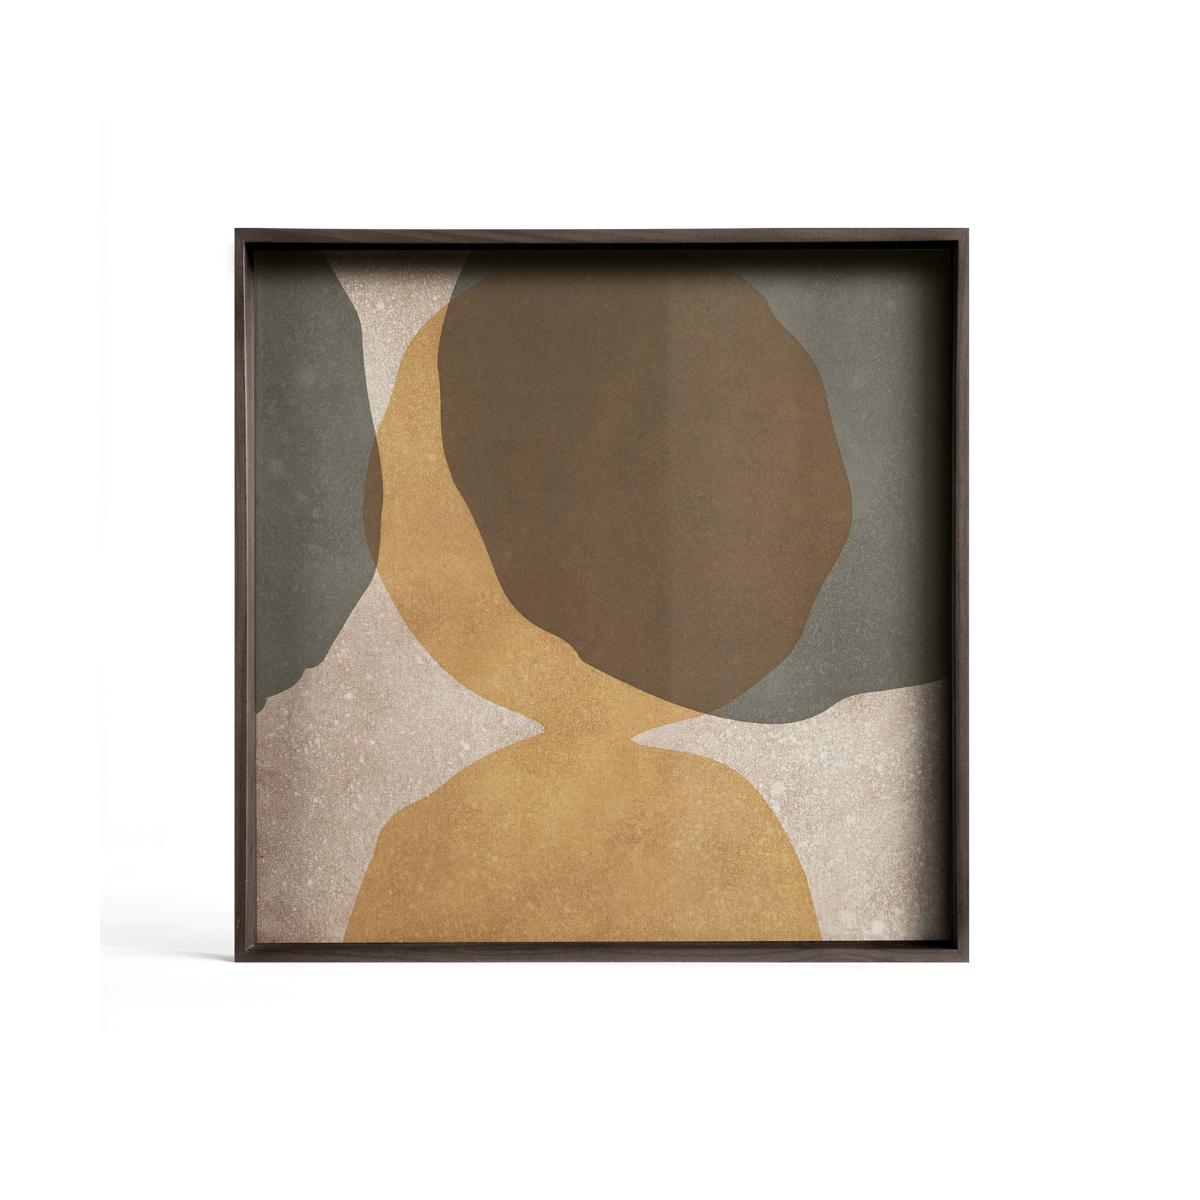 Taca dekoracyjna Cinnamon Overlapping Dots Glass S Ethnicraft